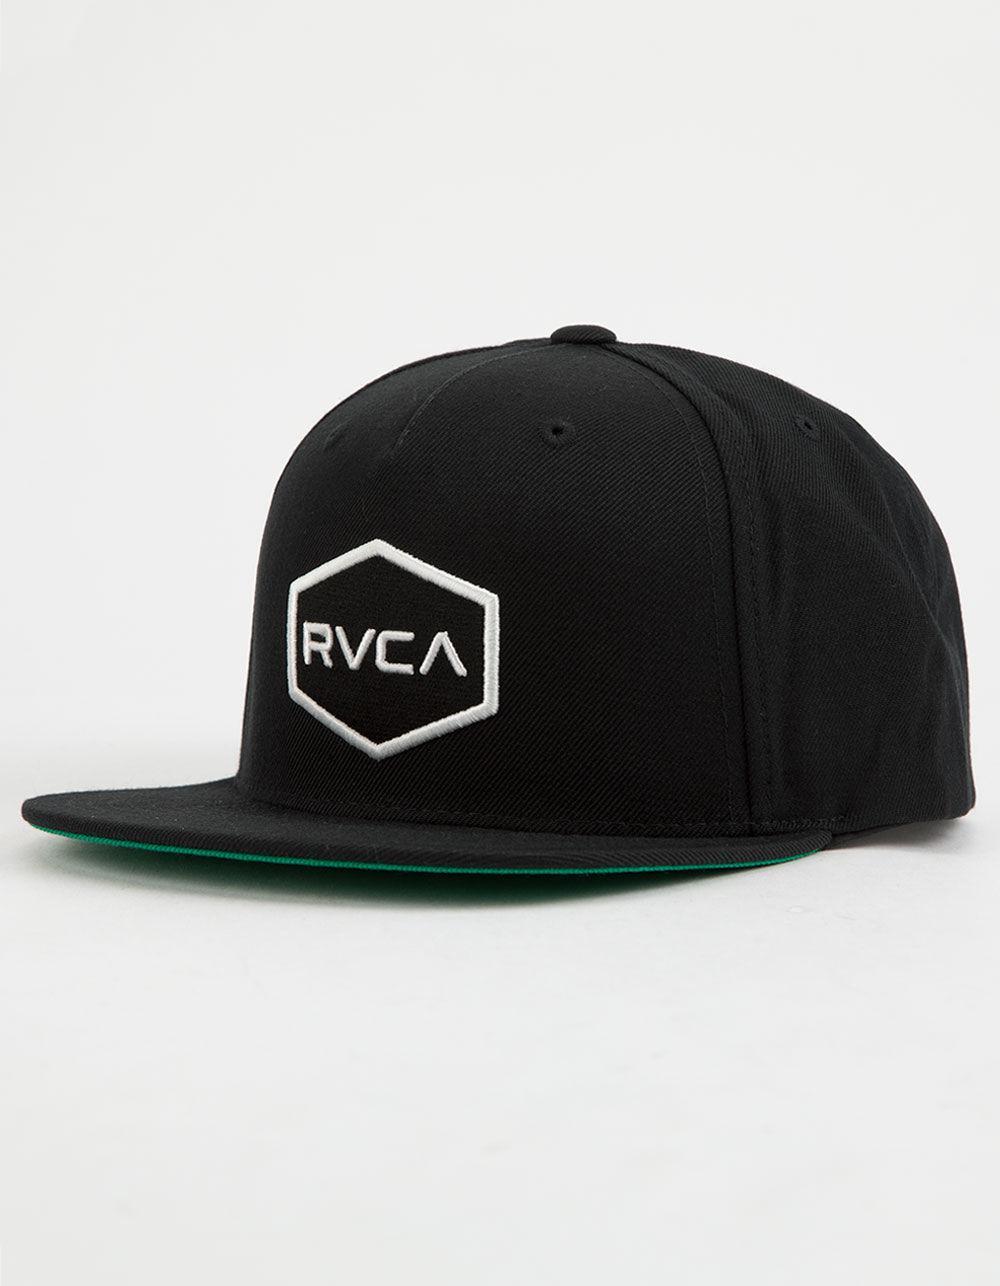 new styles e0ab8 fb7e1 ... inexpensive rvca black commonwealth snapback ii hat for men lyst. view  fullscreen 739e2 9d482